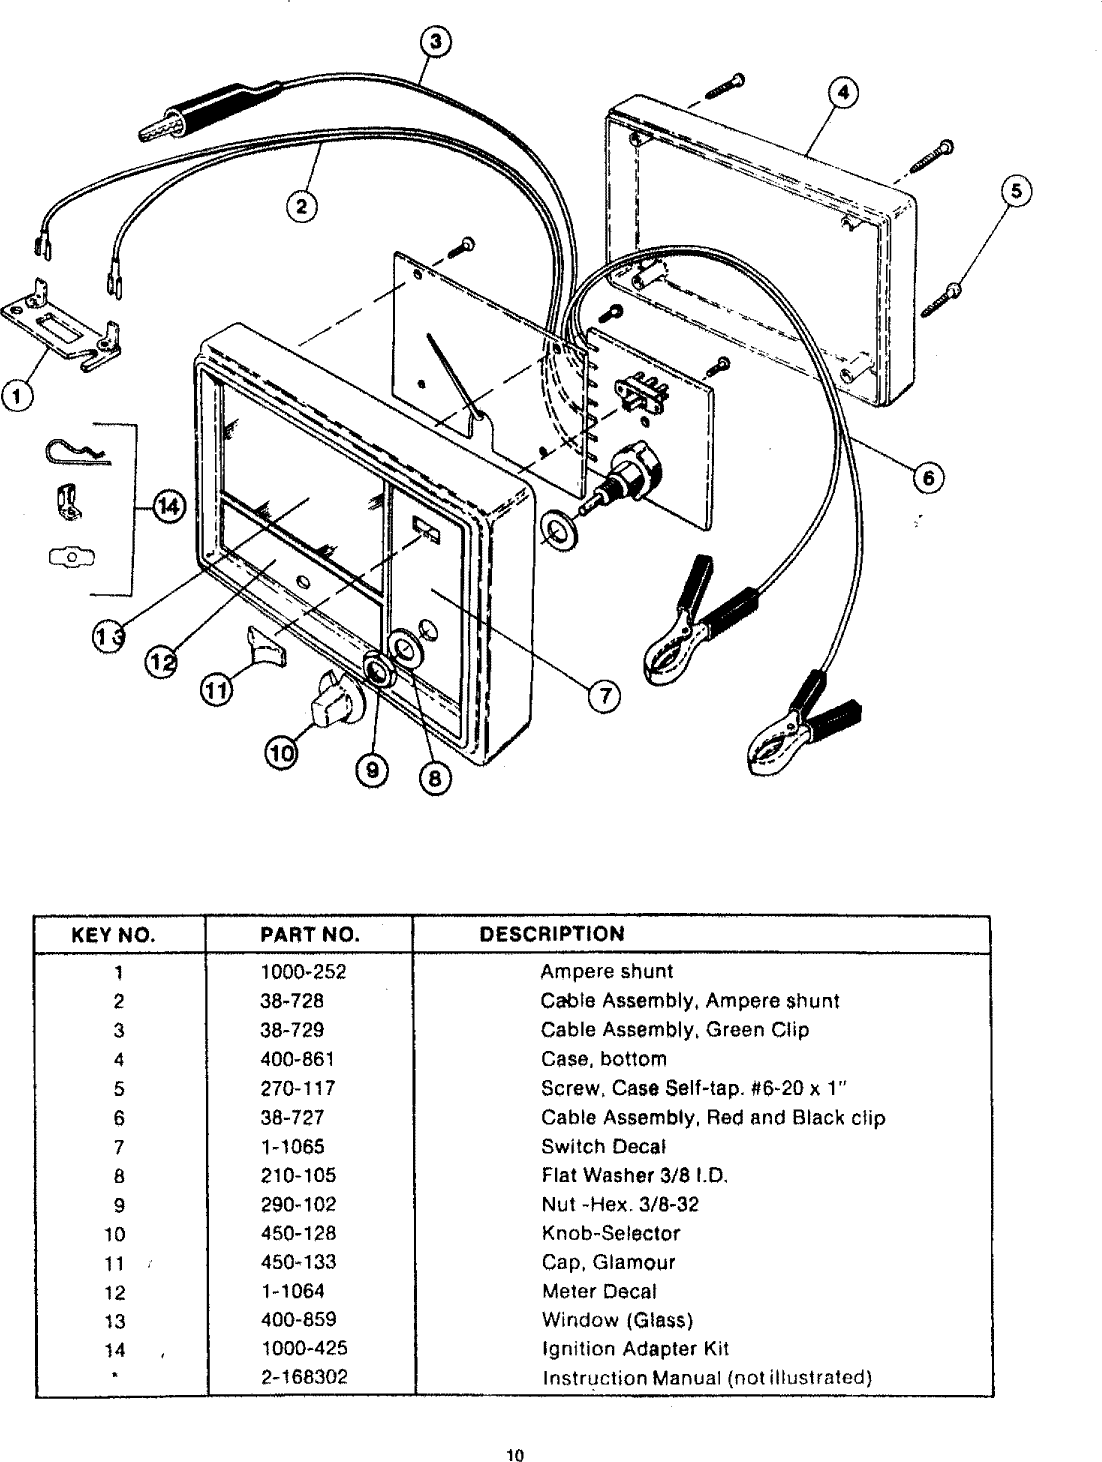 Array chrysler 300 chrome ebooks user manuals guide user manuals rh chrysler 300 chrome ebooks array curb wiring diagram